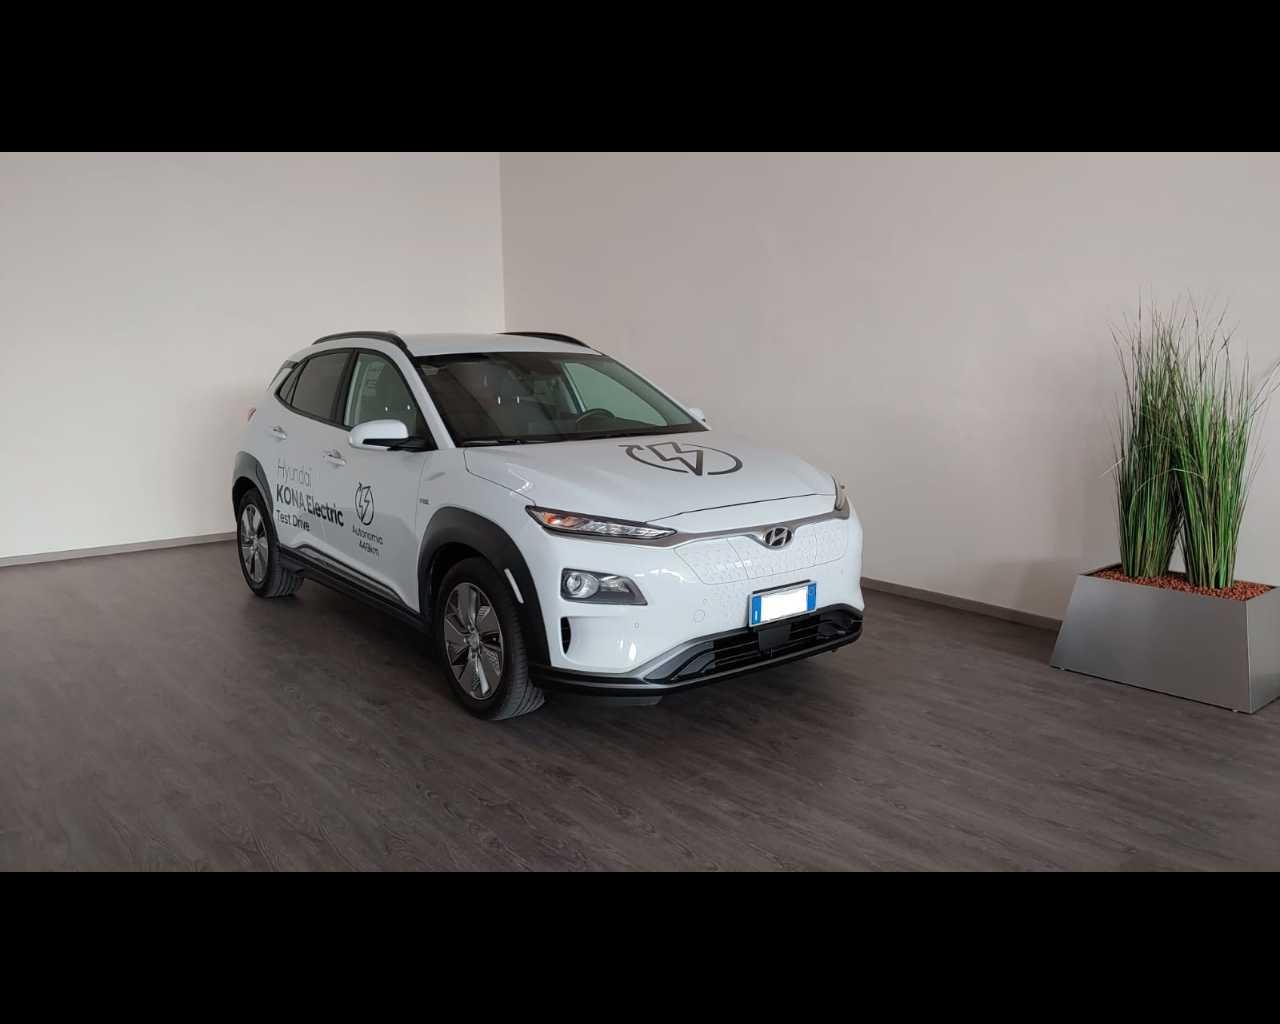 HYUNDAI  Kona 64 kWh EV Exellence, Elettrica, €34.900 - Kona Electric 2018 - Kona 64 Kwh Ev Exellence